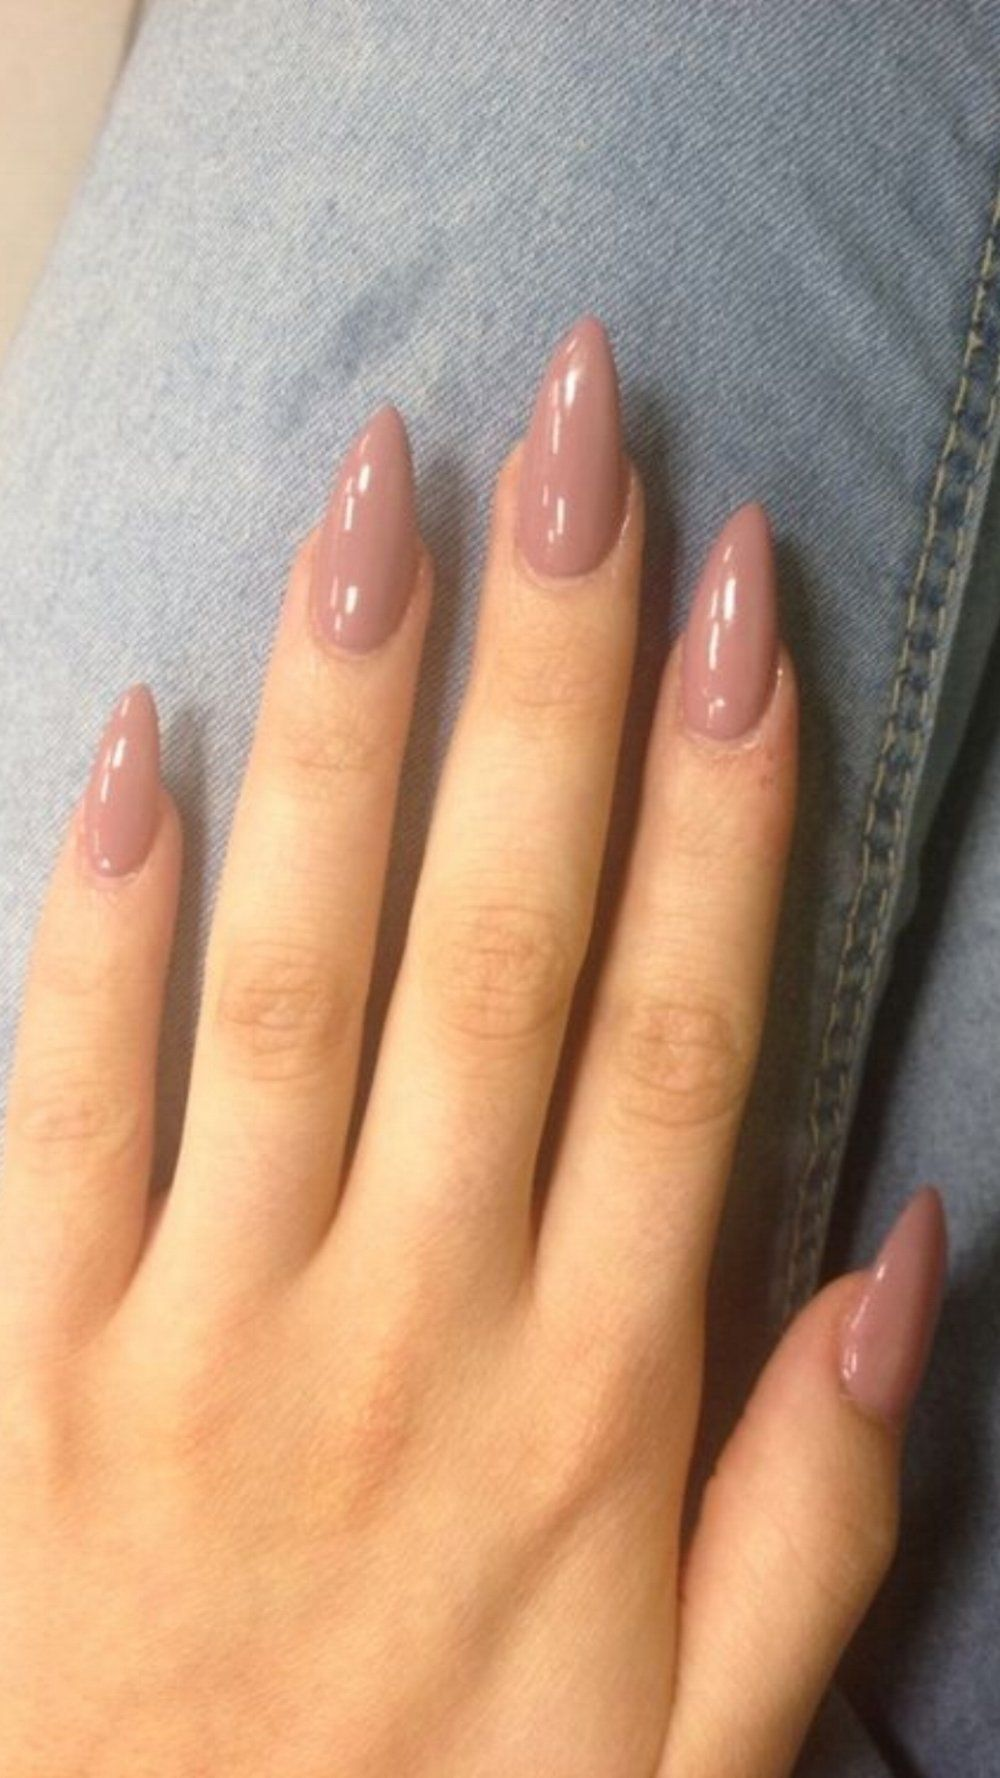 Oval Shaped Long Acrylic Pink Nails Pinknails Natural Acrylic Nails Long Acrylic Nails Almond Acrylic Nails